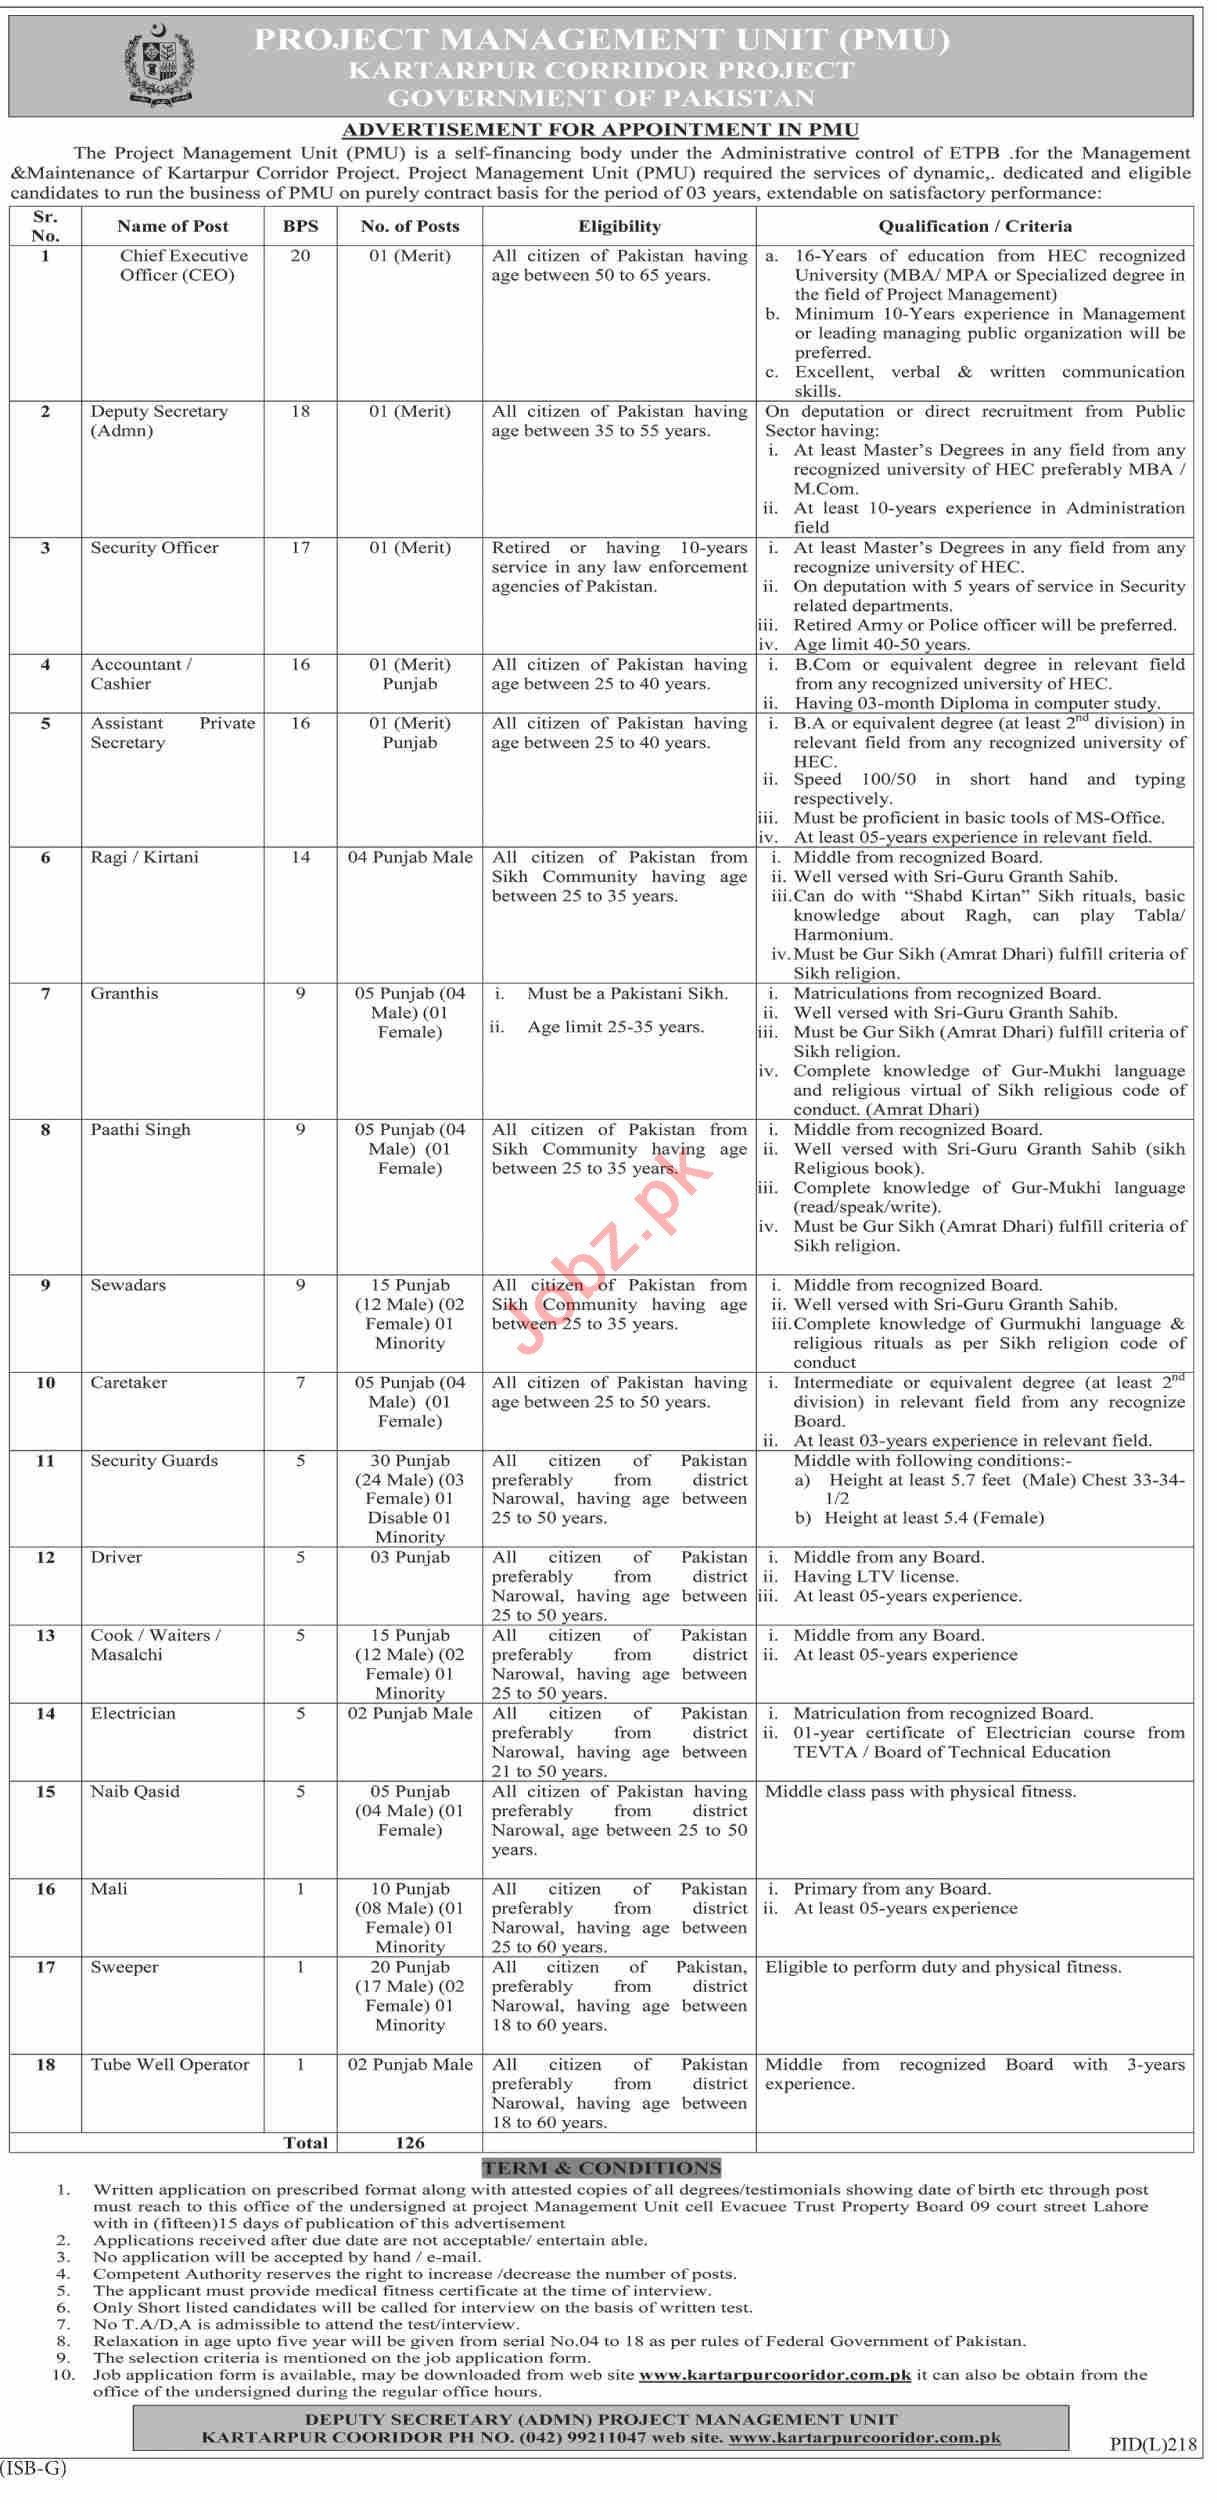 Kartarpur Corridor Project Jobs 2021 for CEO & Secretary